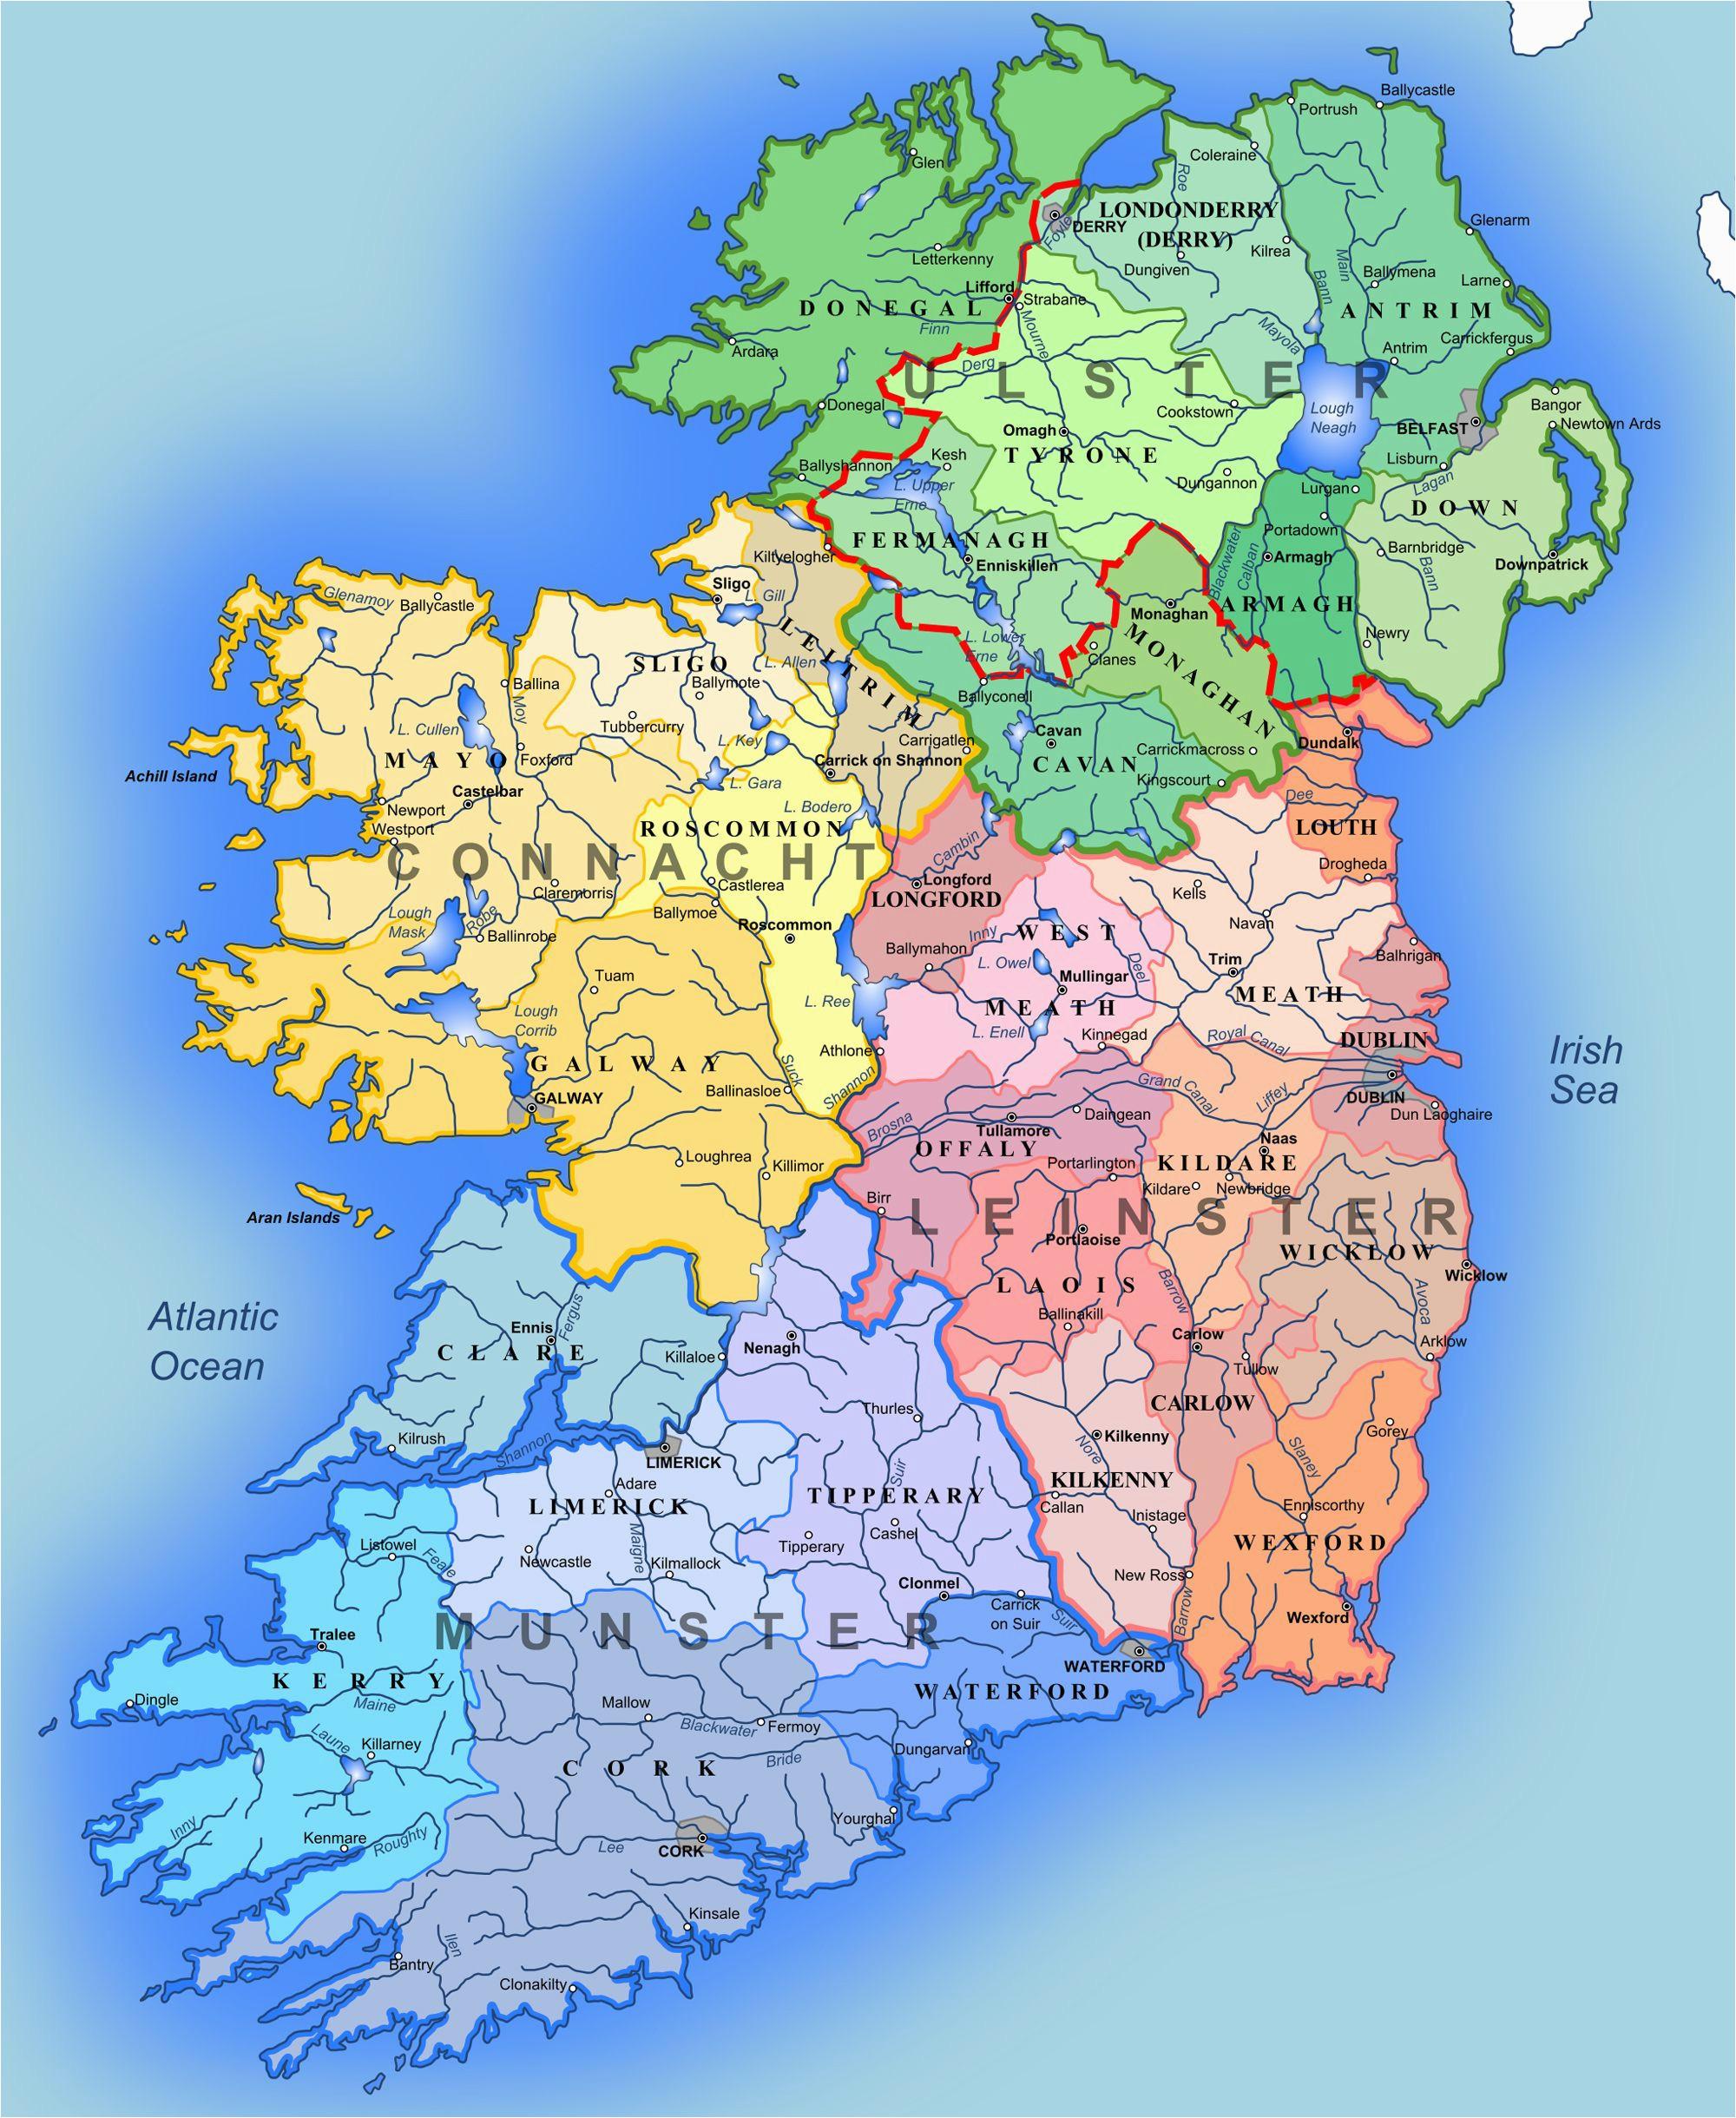 County Limerick Ireland Map Detailed Large Map Of Ireland Administrative Map Of Ireland